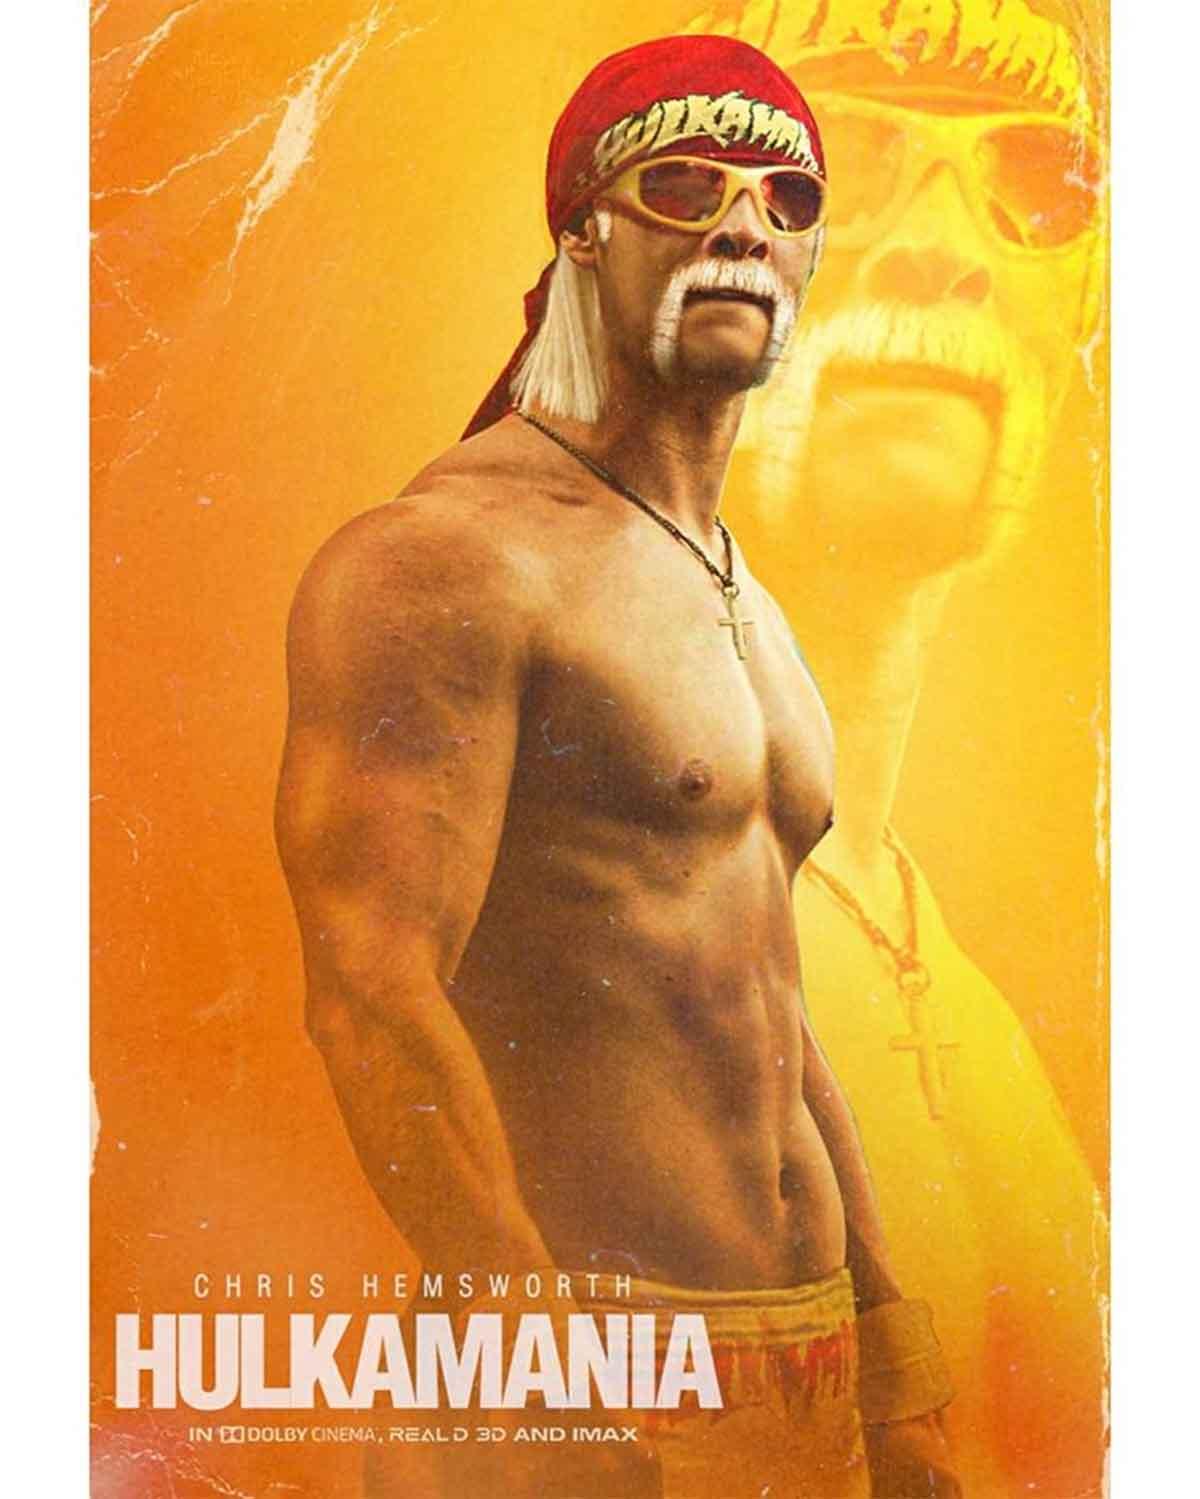 Spectacular Fan Art by Chris Hemsworth as Hulk Hogan